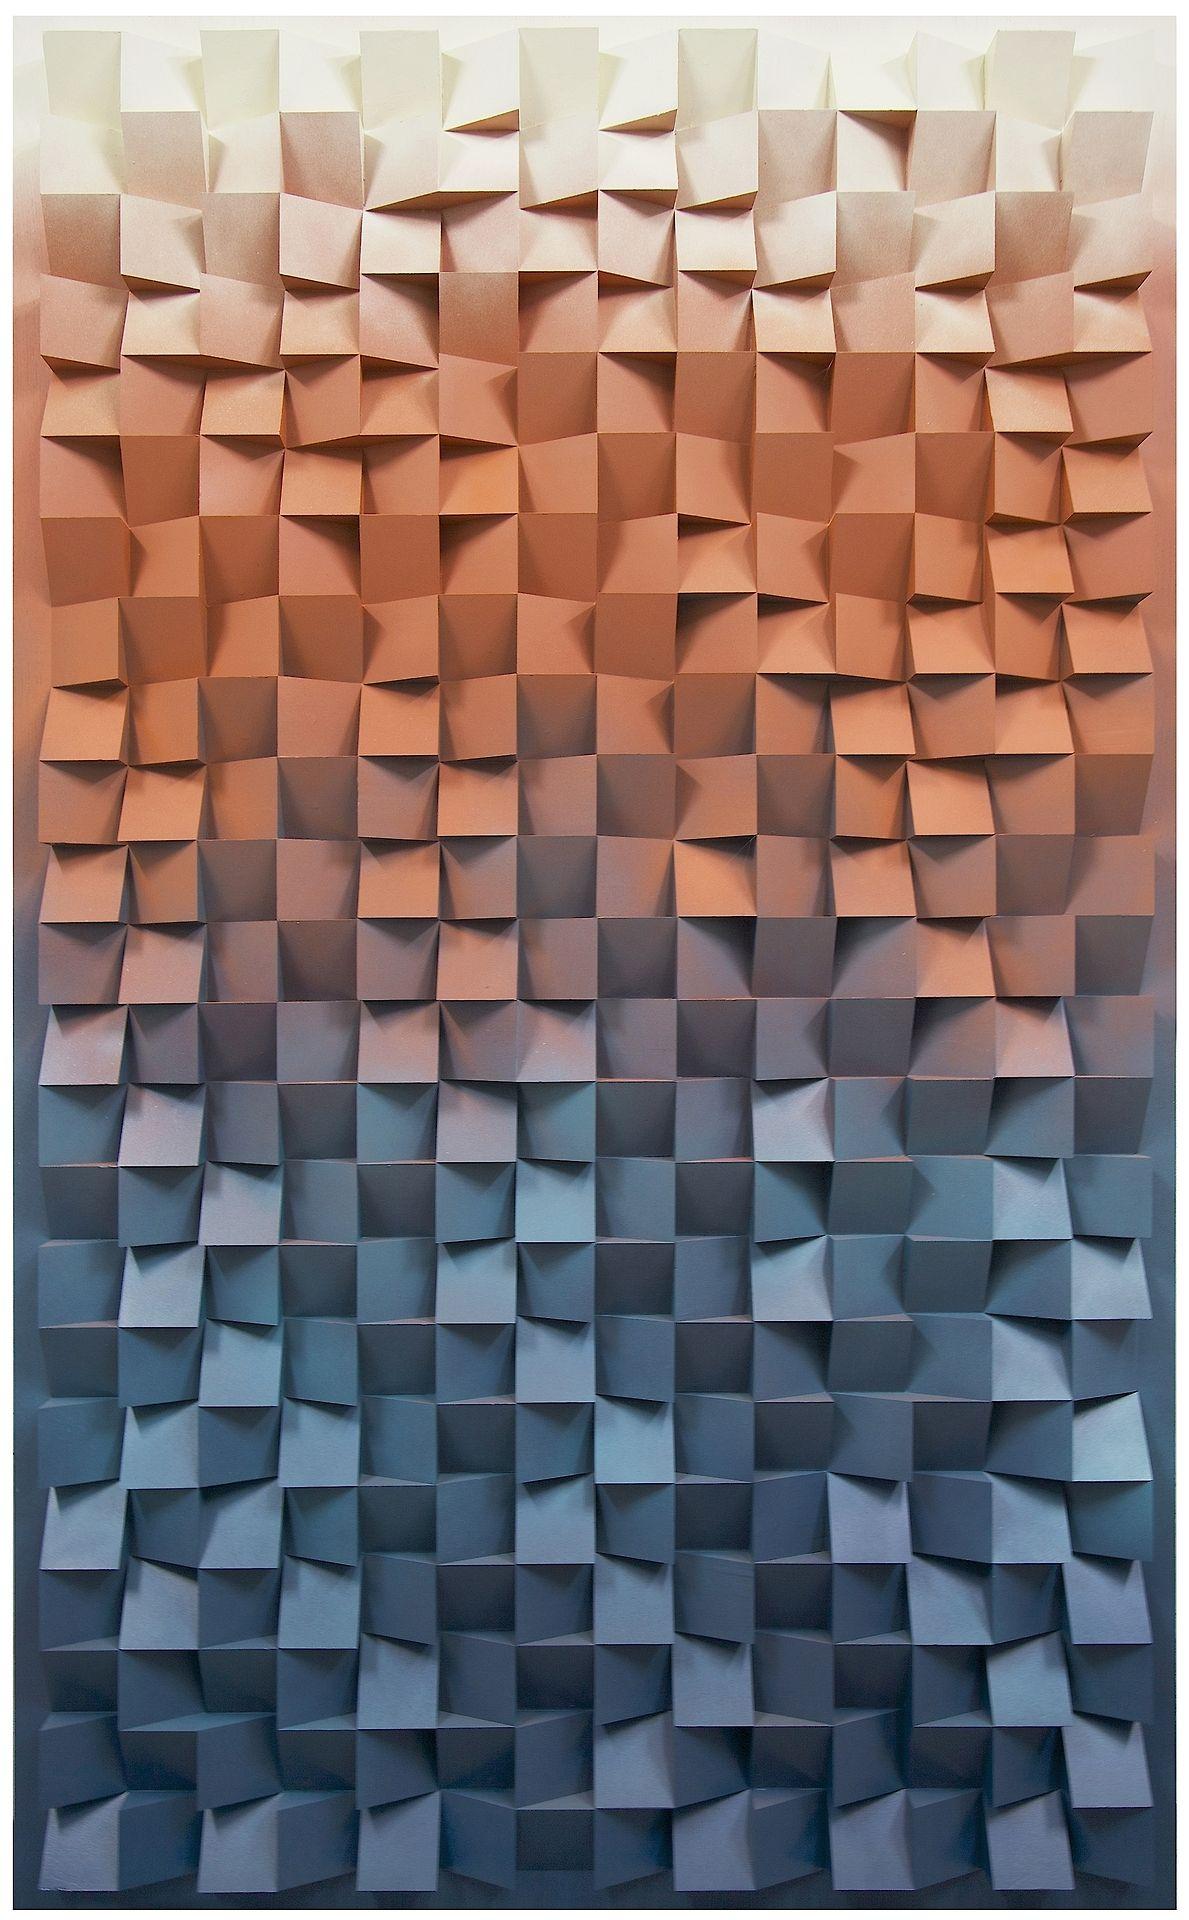 myampgoesto11 jan albers texture pinterest patterns walls and wallpaper. Black Bedroom Furniture Sets. Home Design Ideas